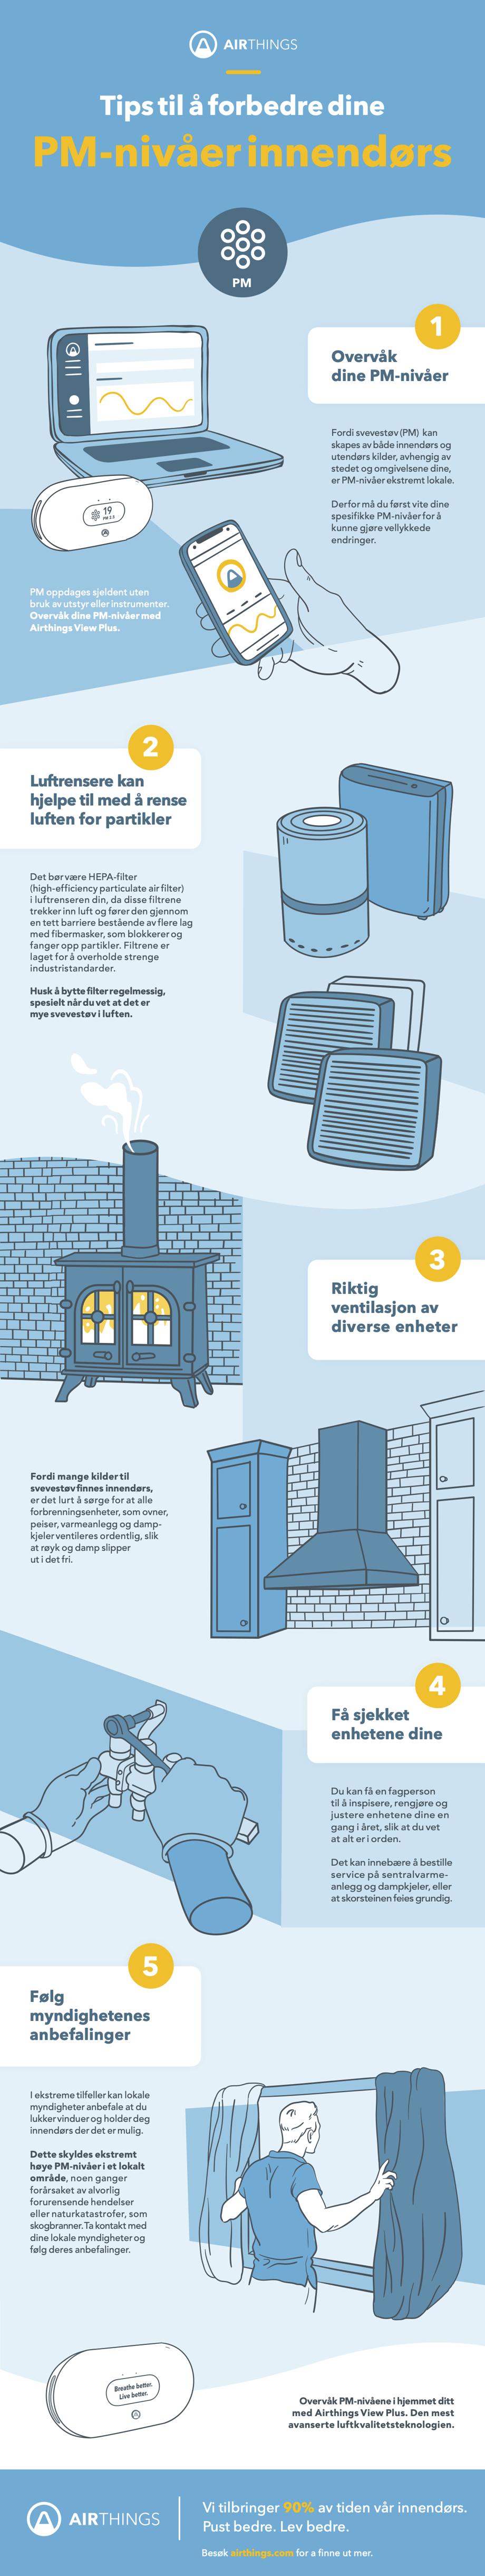 top tips Airthings-Infographic-PM_B2C_Norwegian